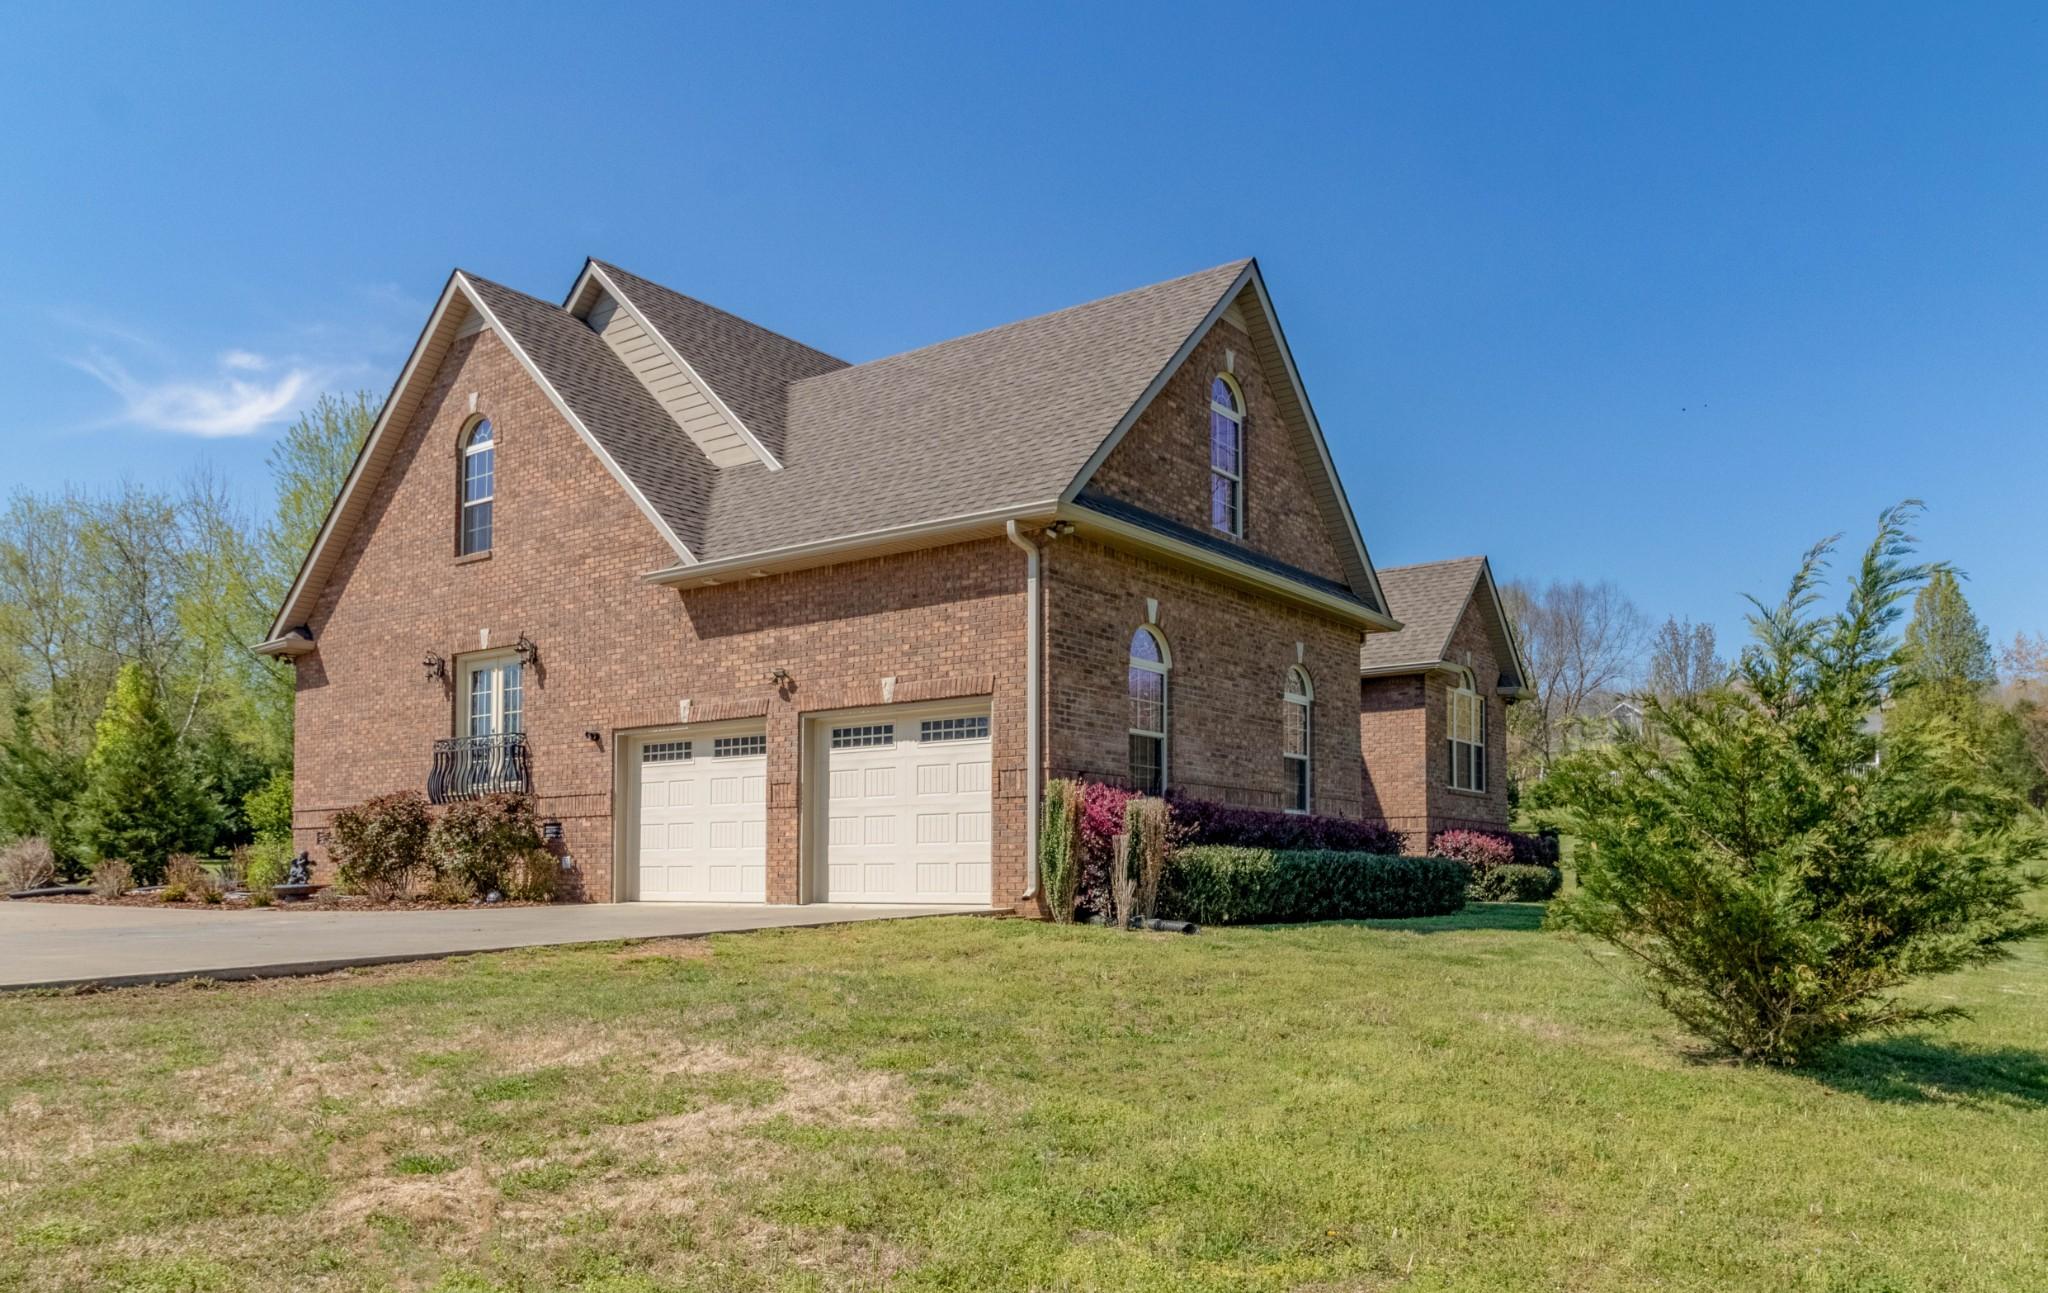 331 Indian Creek Rd, Cumberland Furnace, TN 37051 - Cumberland Furnace, TN real estate listing